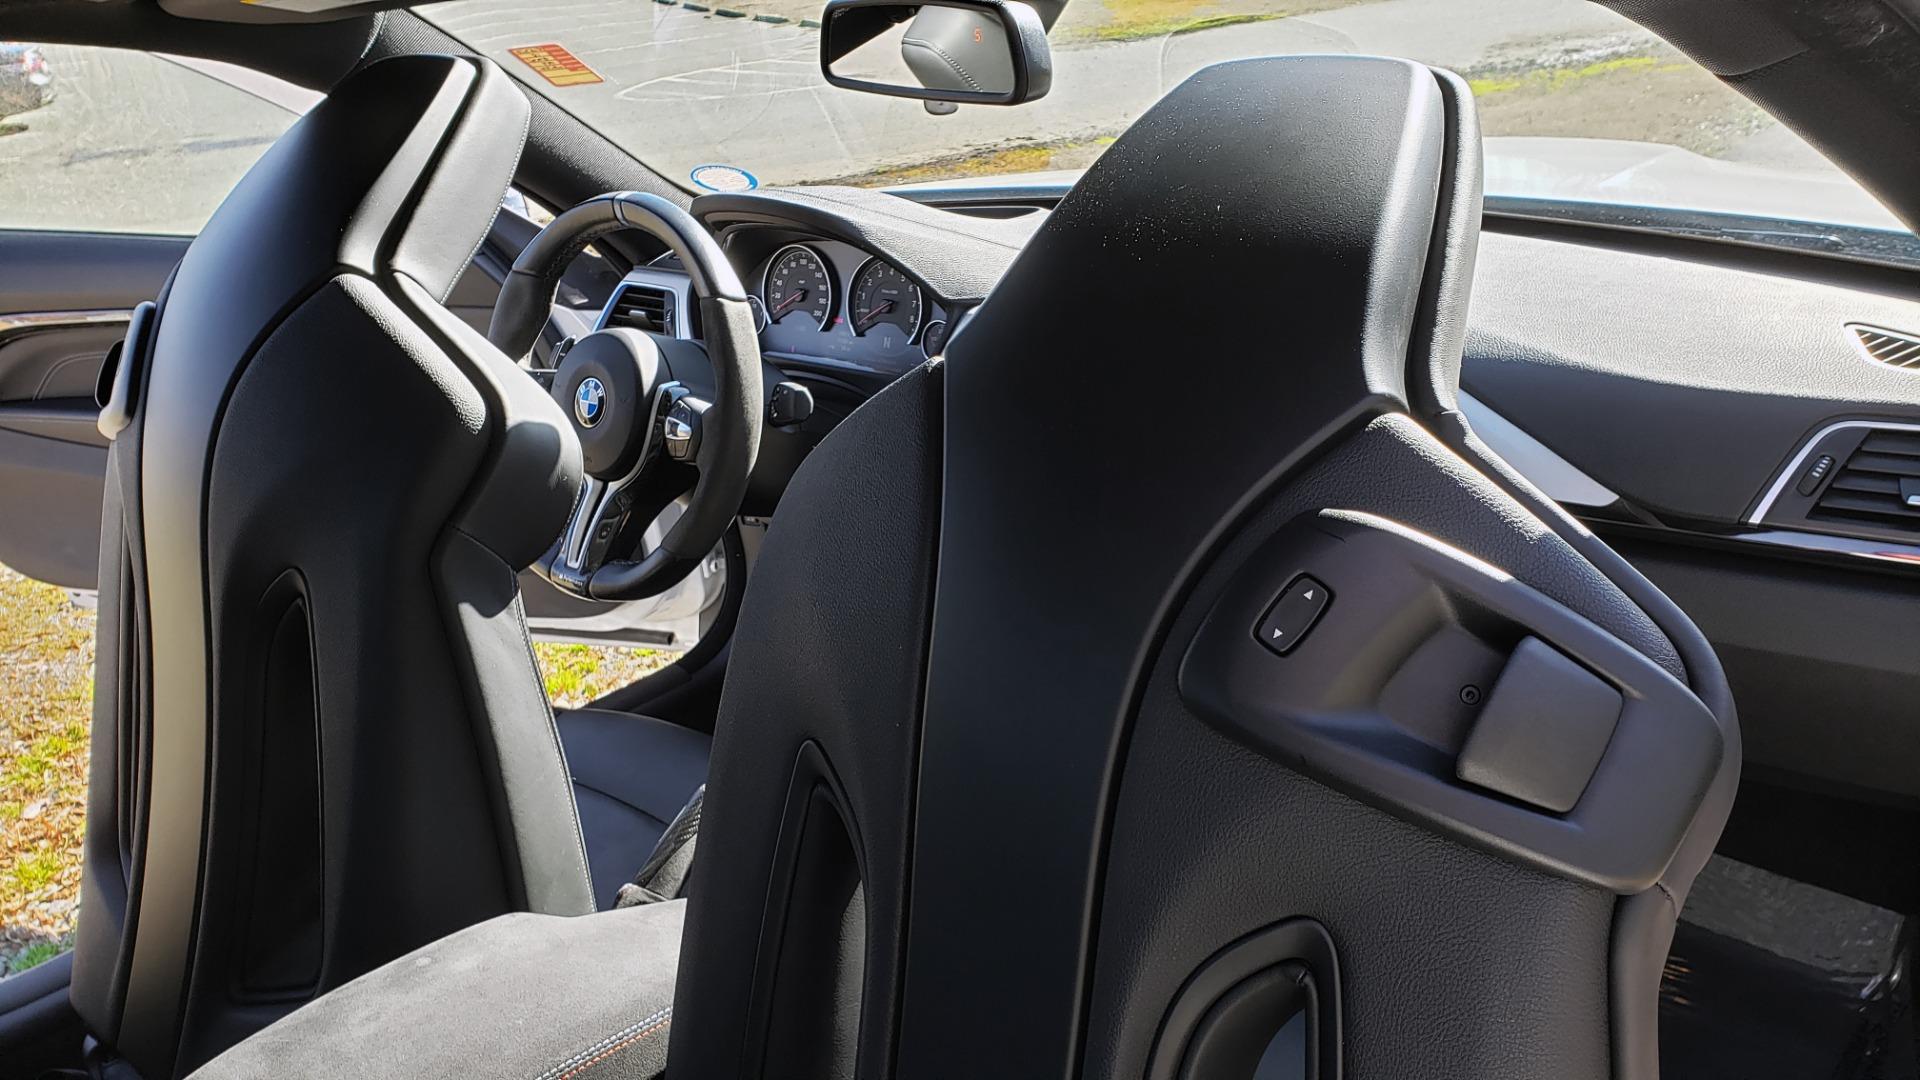 Used 2018 BMW M4 COMP PKG / EXEC / M-DRIVER / PARK CNTRL / ACTIVE BLIND SPOT for sale $45,449 at Formula Imports in Charlotte NC 28227 62